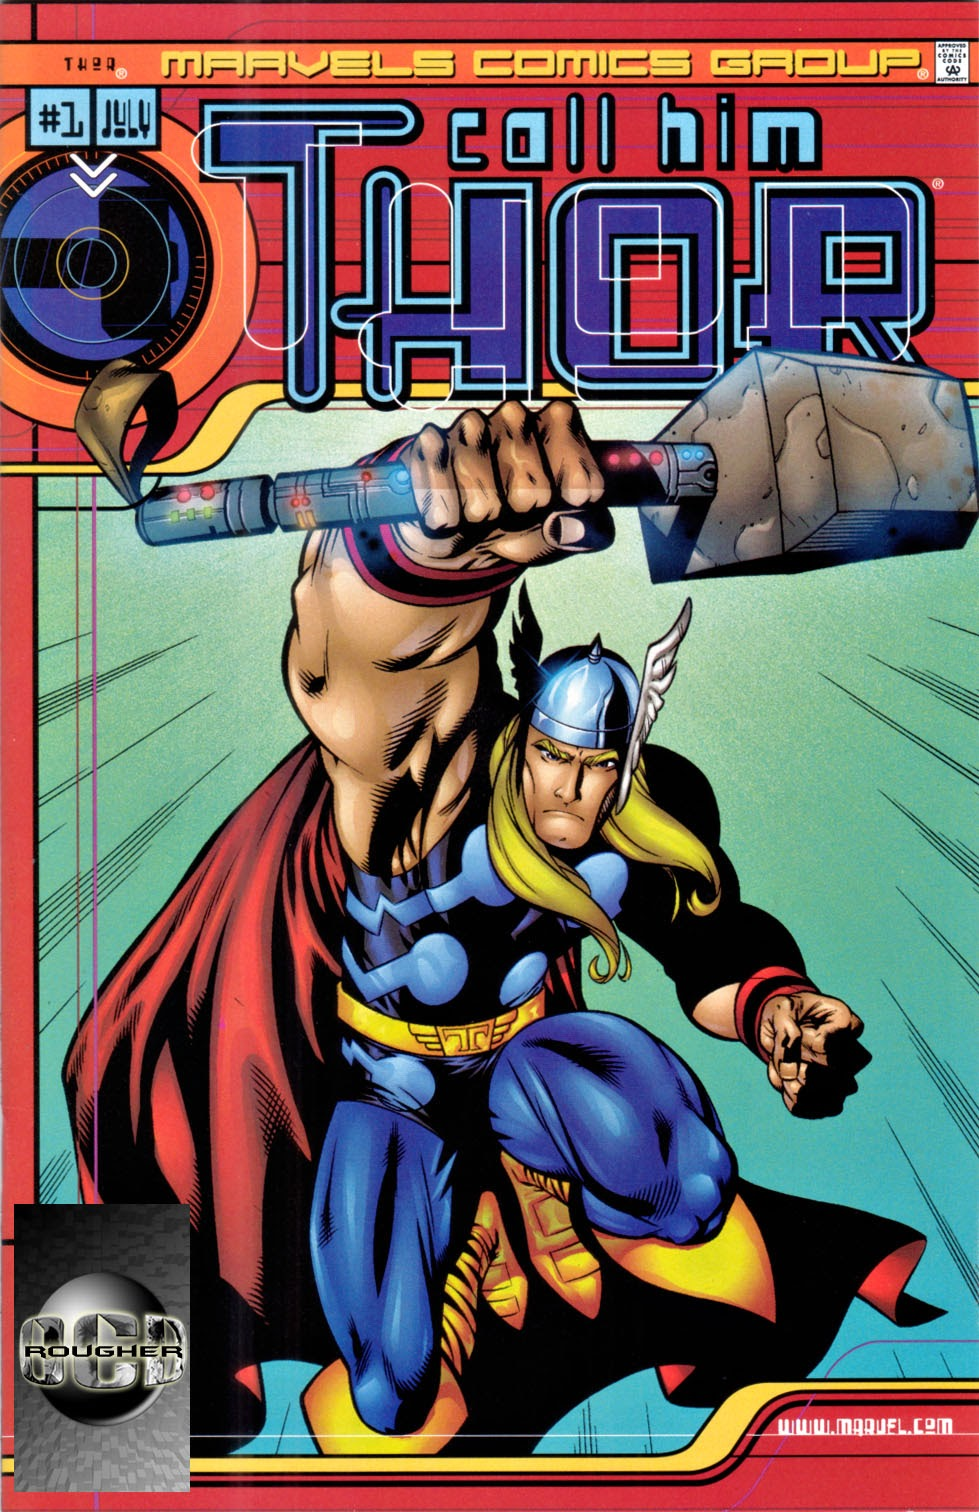 Marvels Comics Thor Page 1